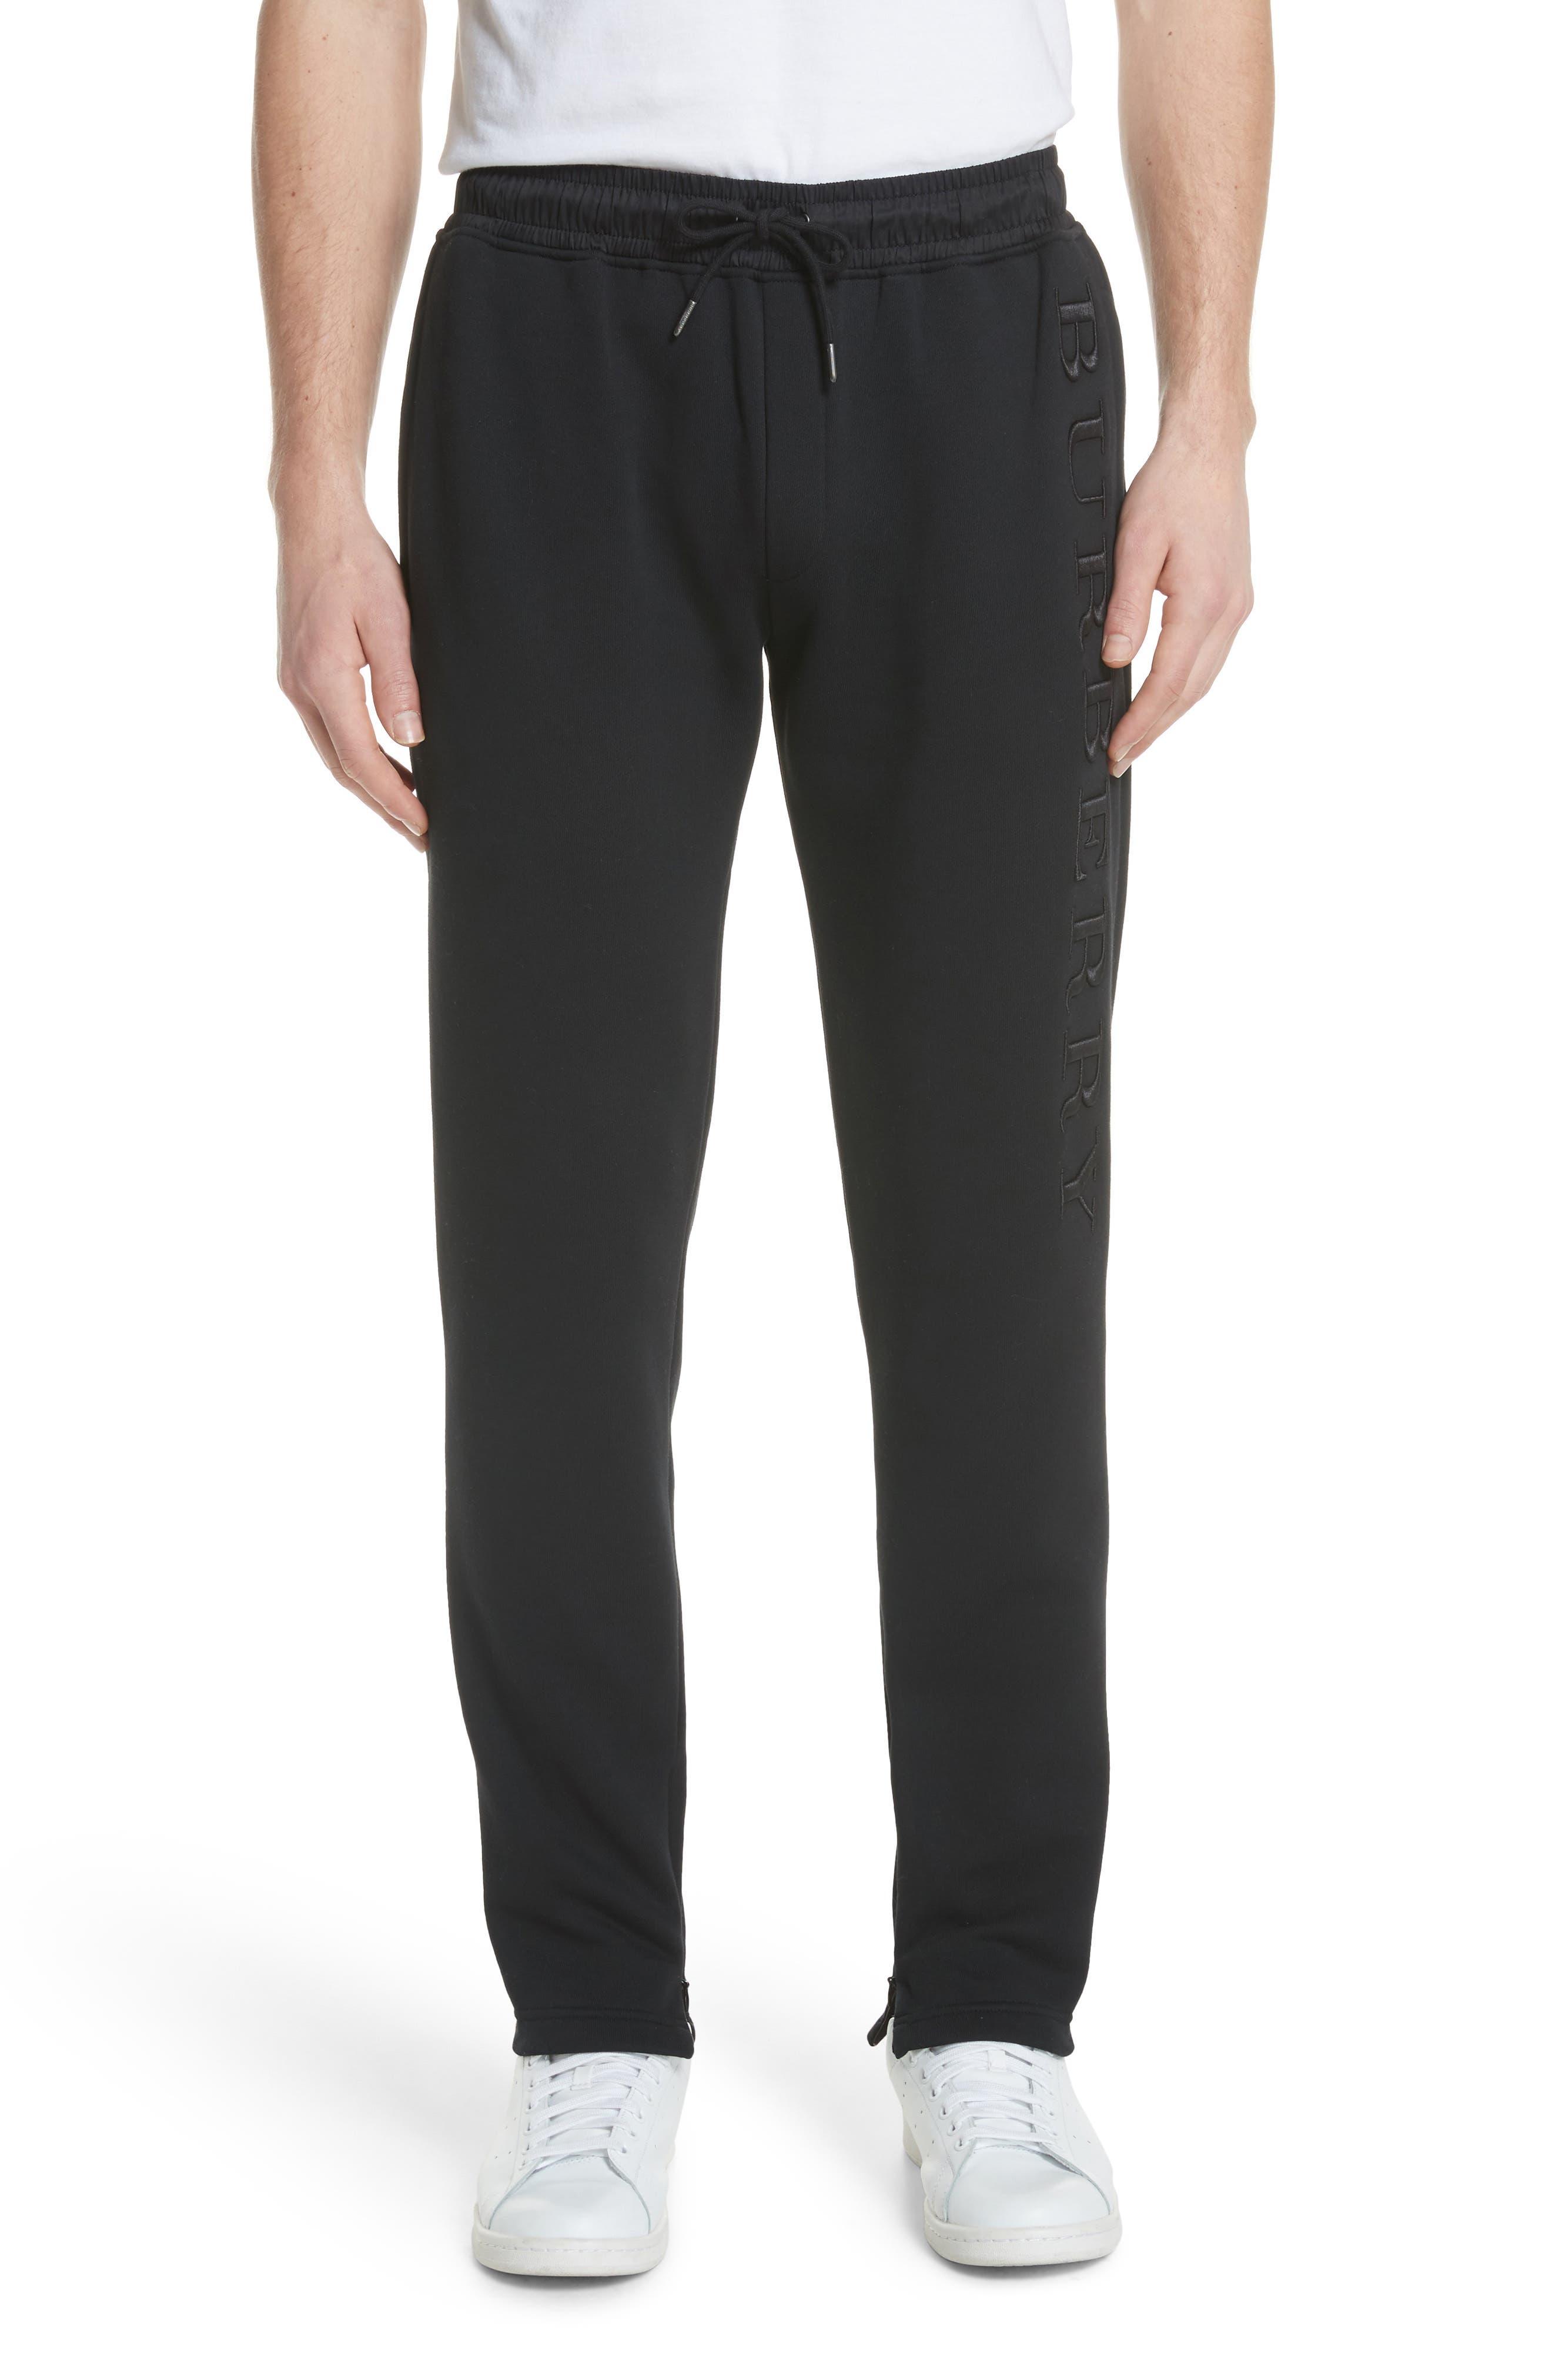 Nickford Lounge Pants,                         Main,                         color,